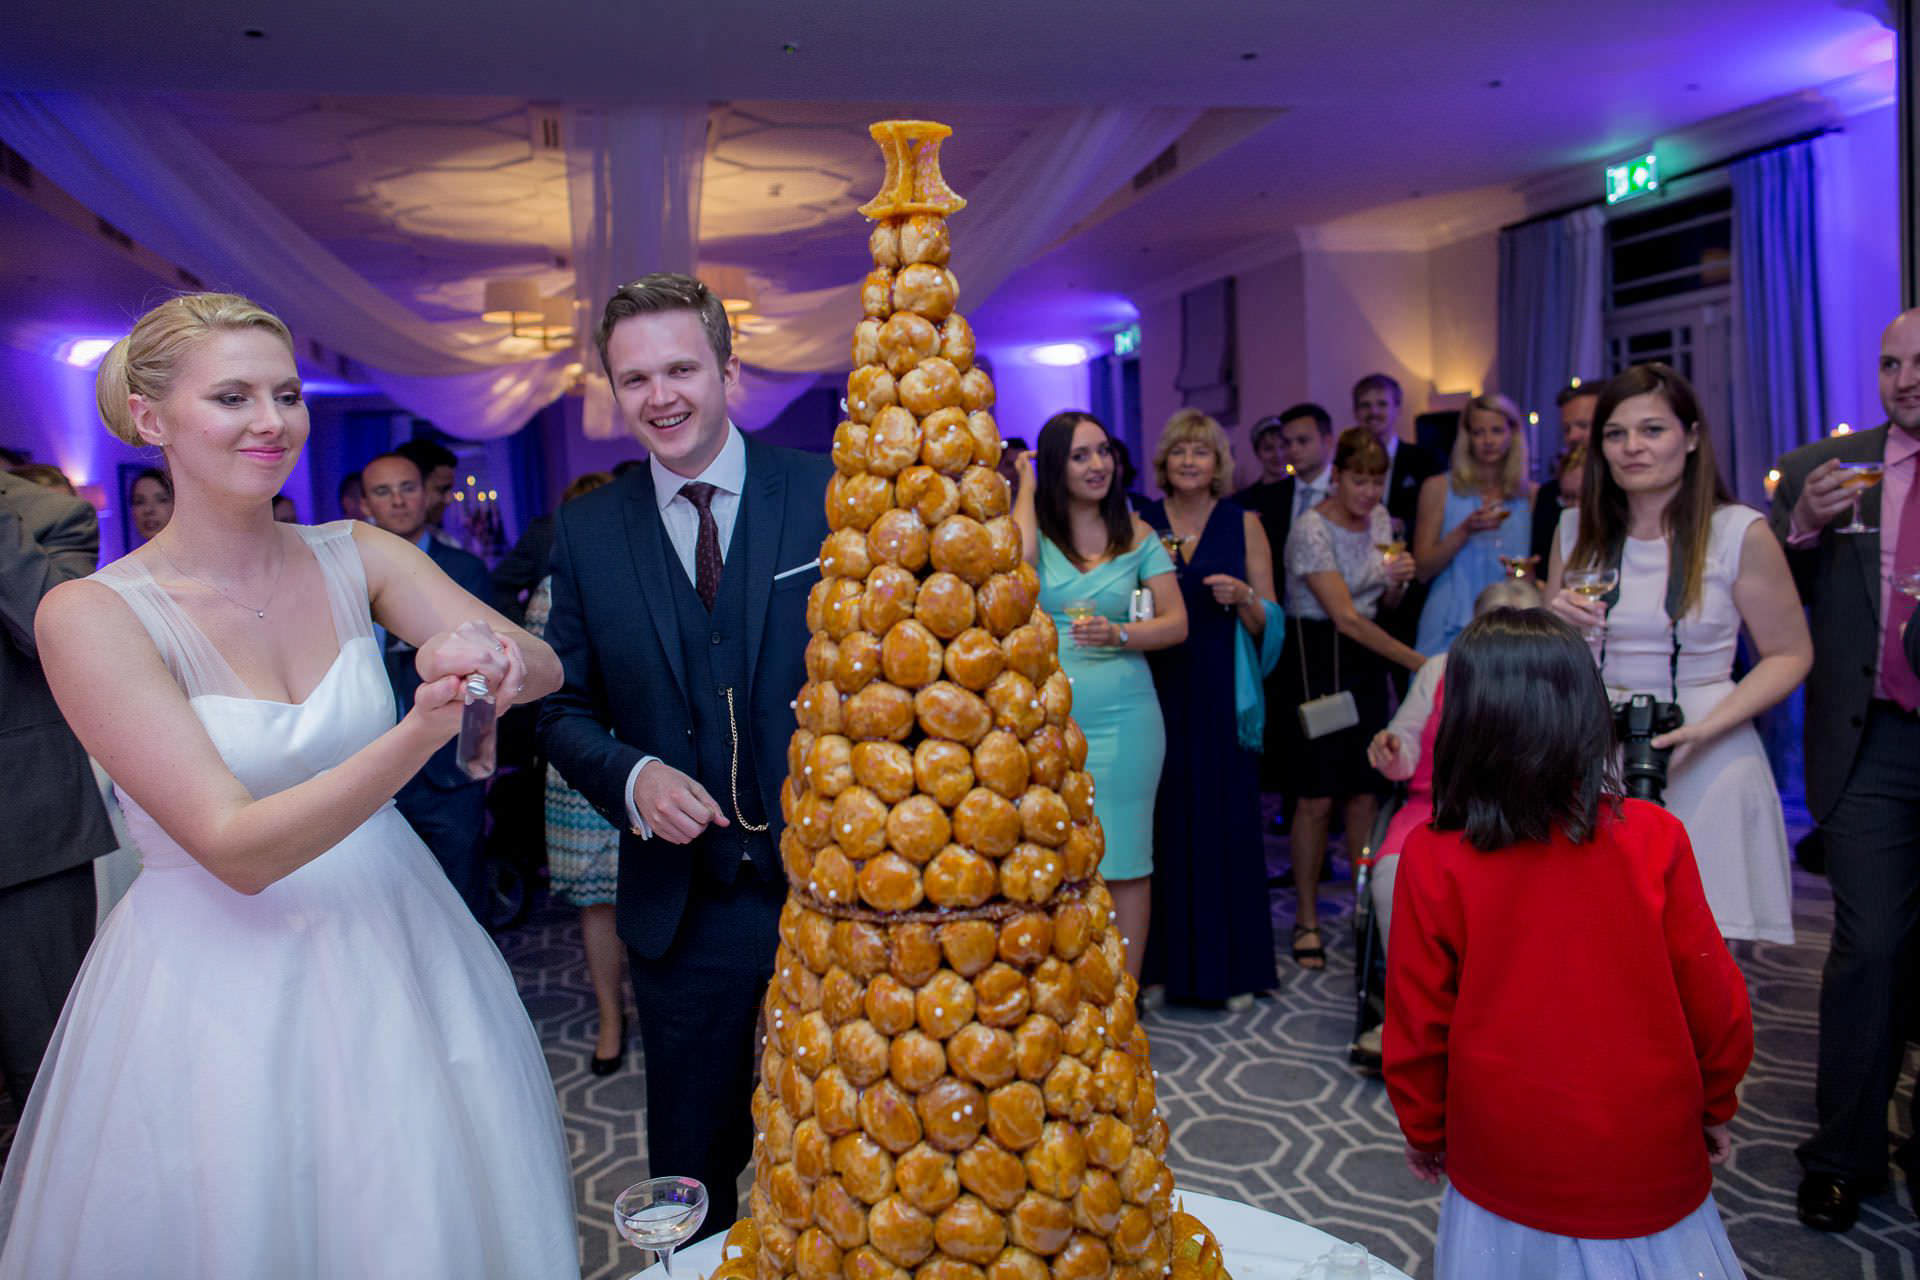 Wotton House wedding cake cutting